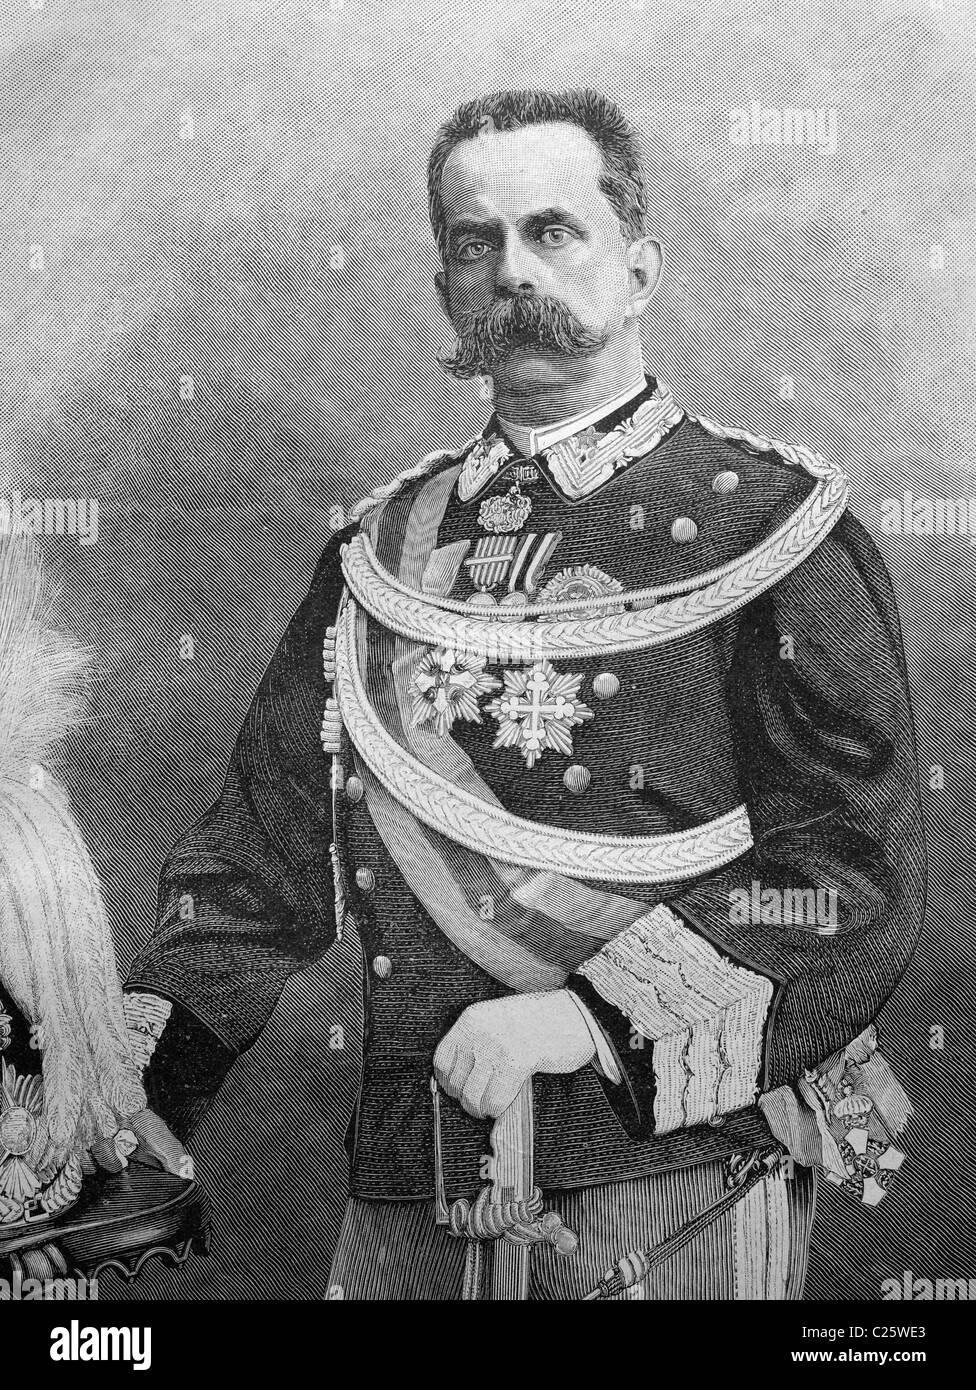 Umberto I, King of Italy, historical illustration circa 1893 - Stock Image